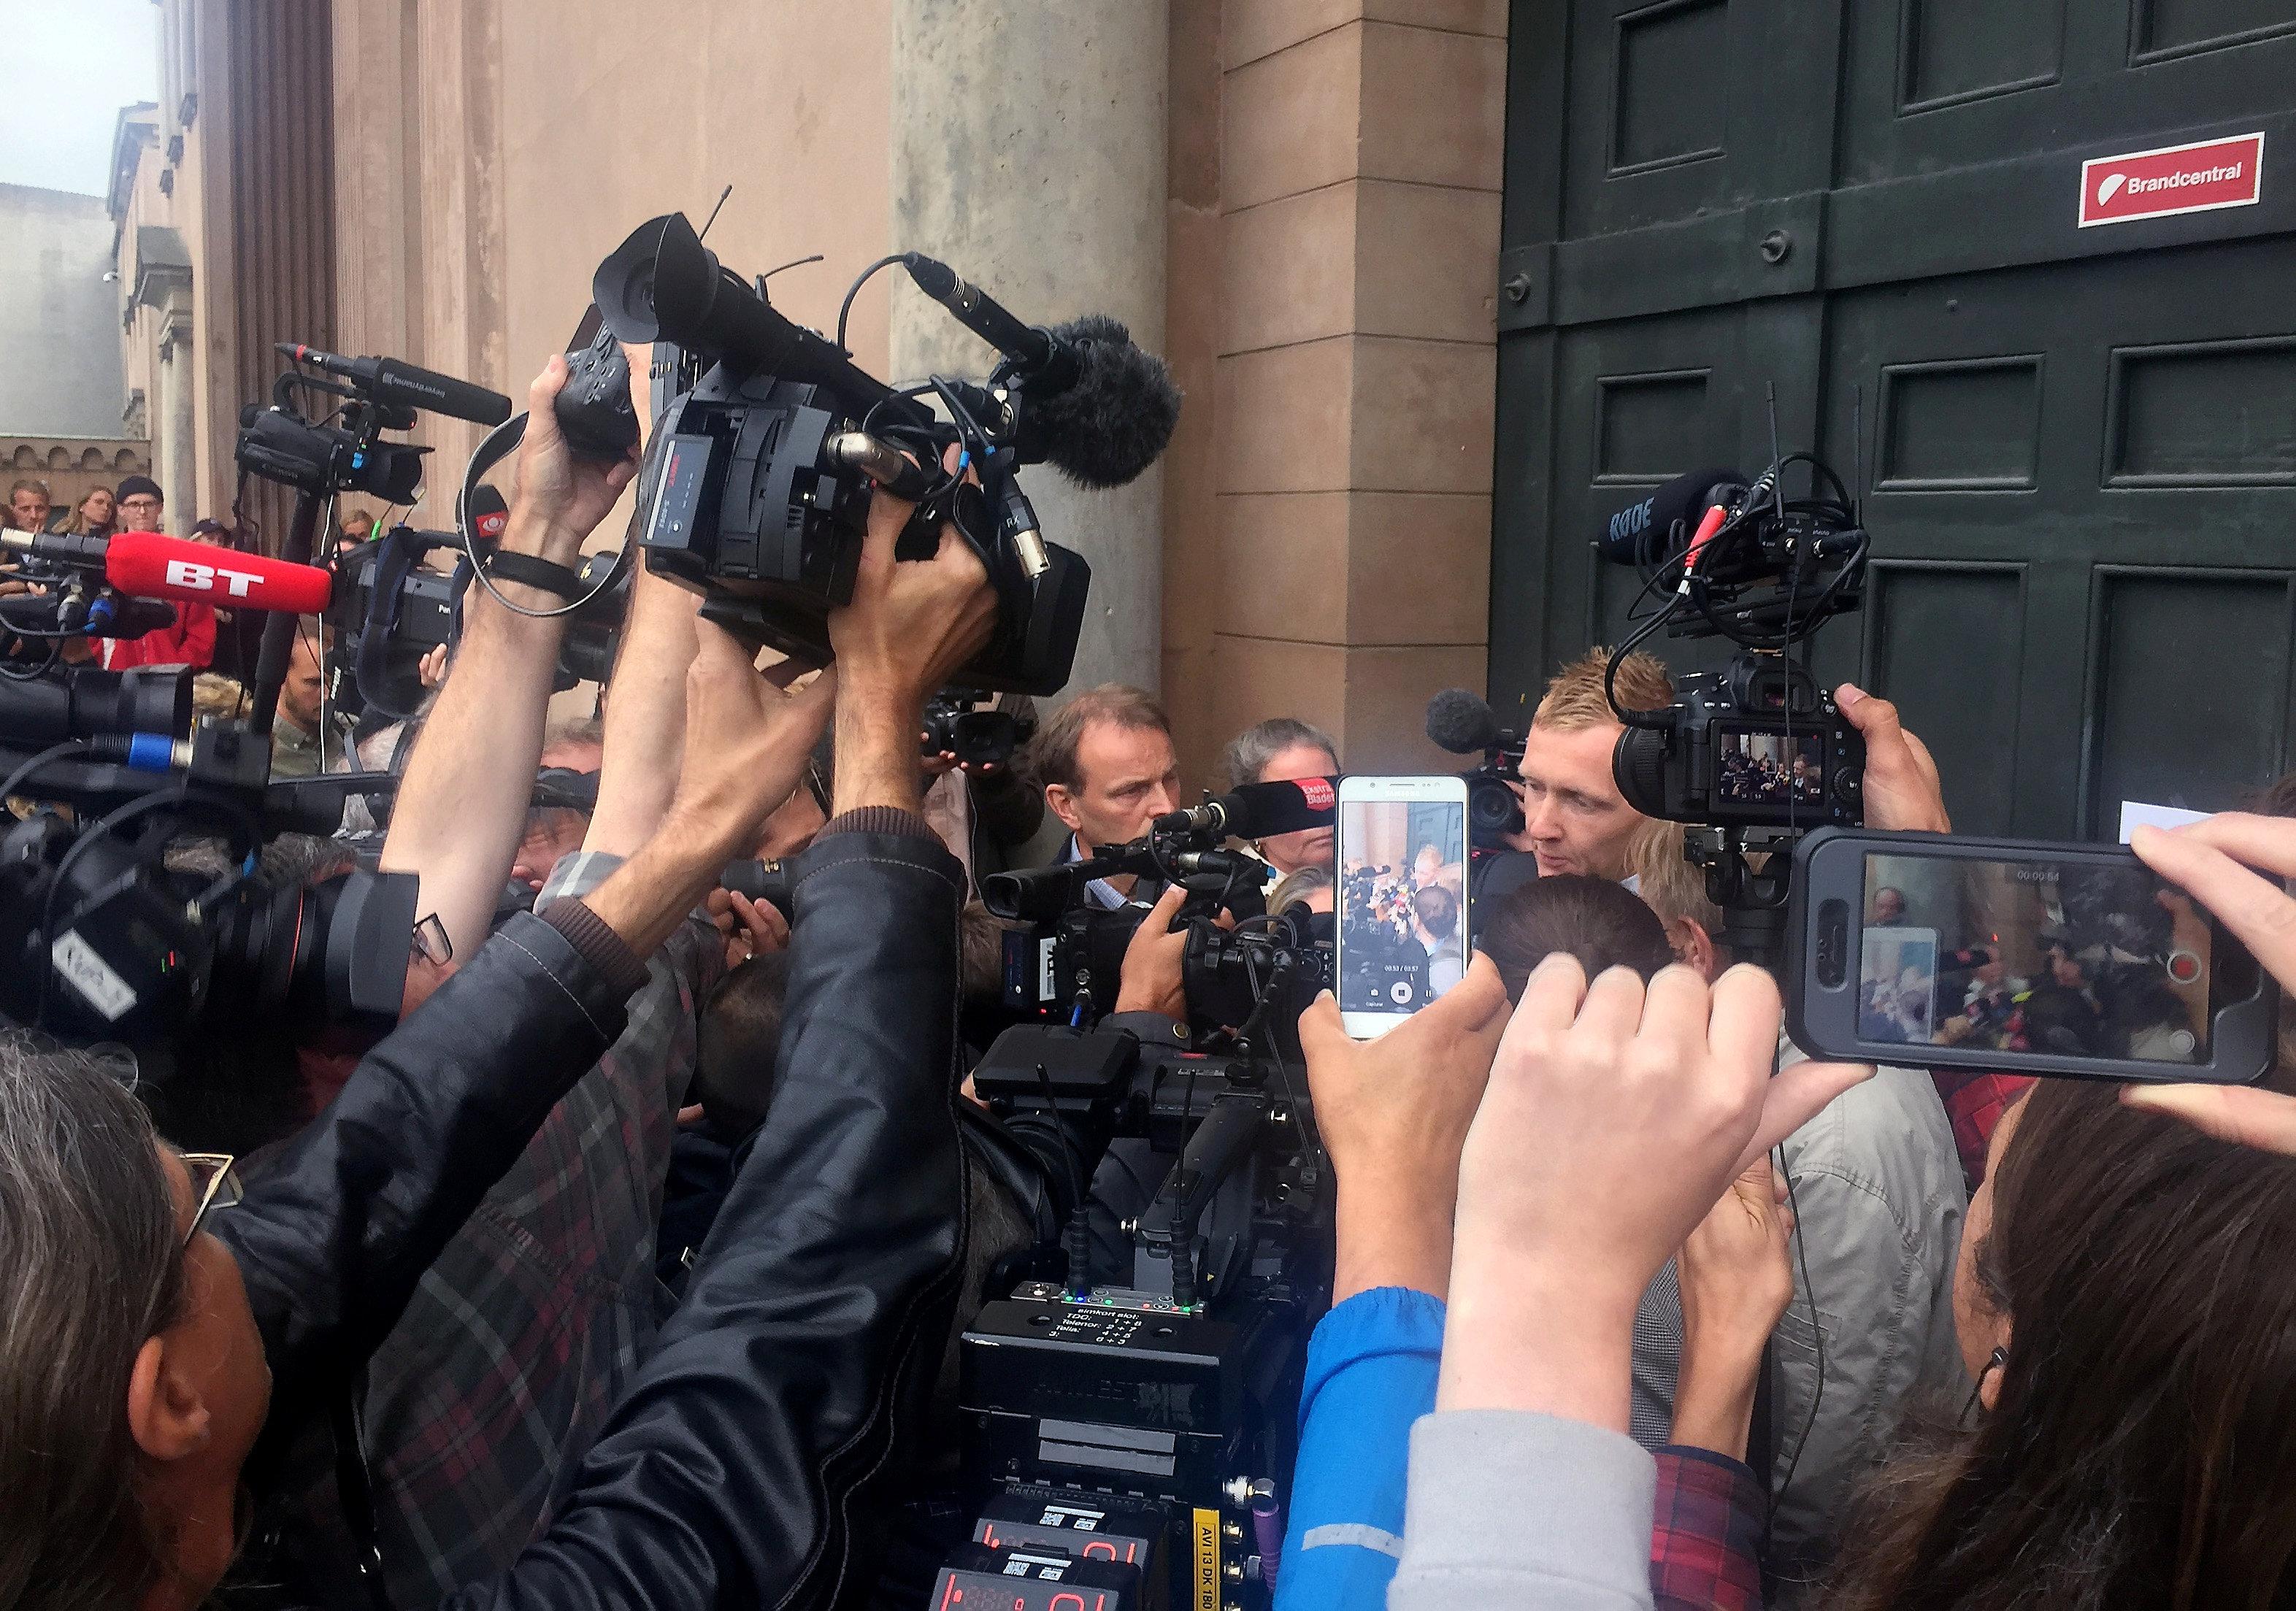 Special prosecutor Jakob Buch-Jepsen talks to the media outside the court in Copenhagen, Denmark on Sept. 5, 2017. (REUTERS/Julie Astrid Thomsen)